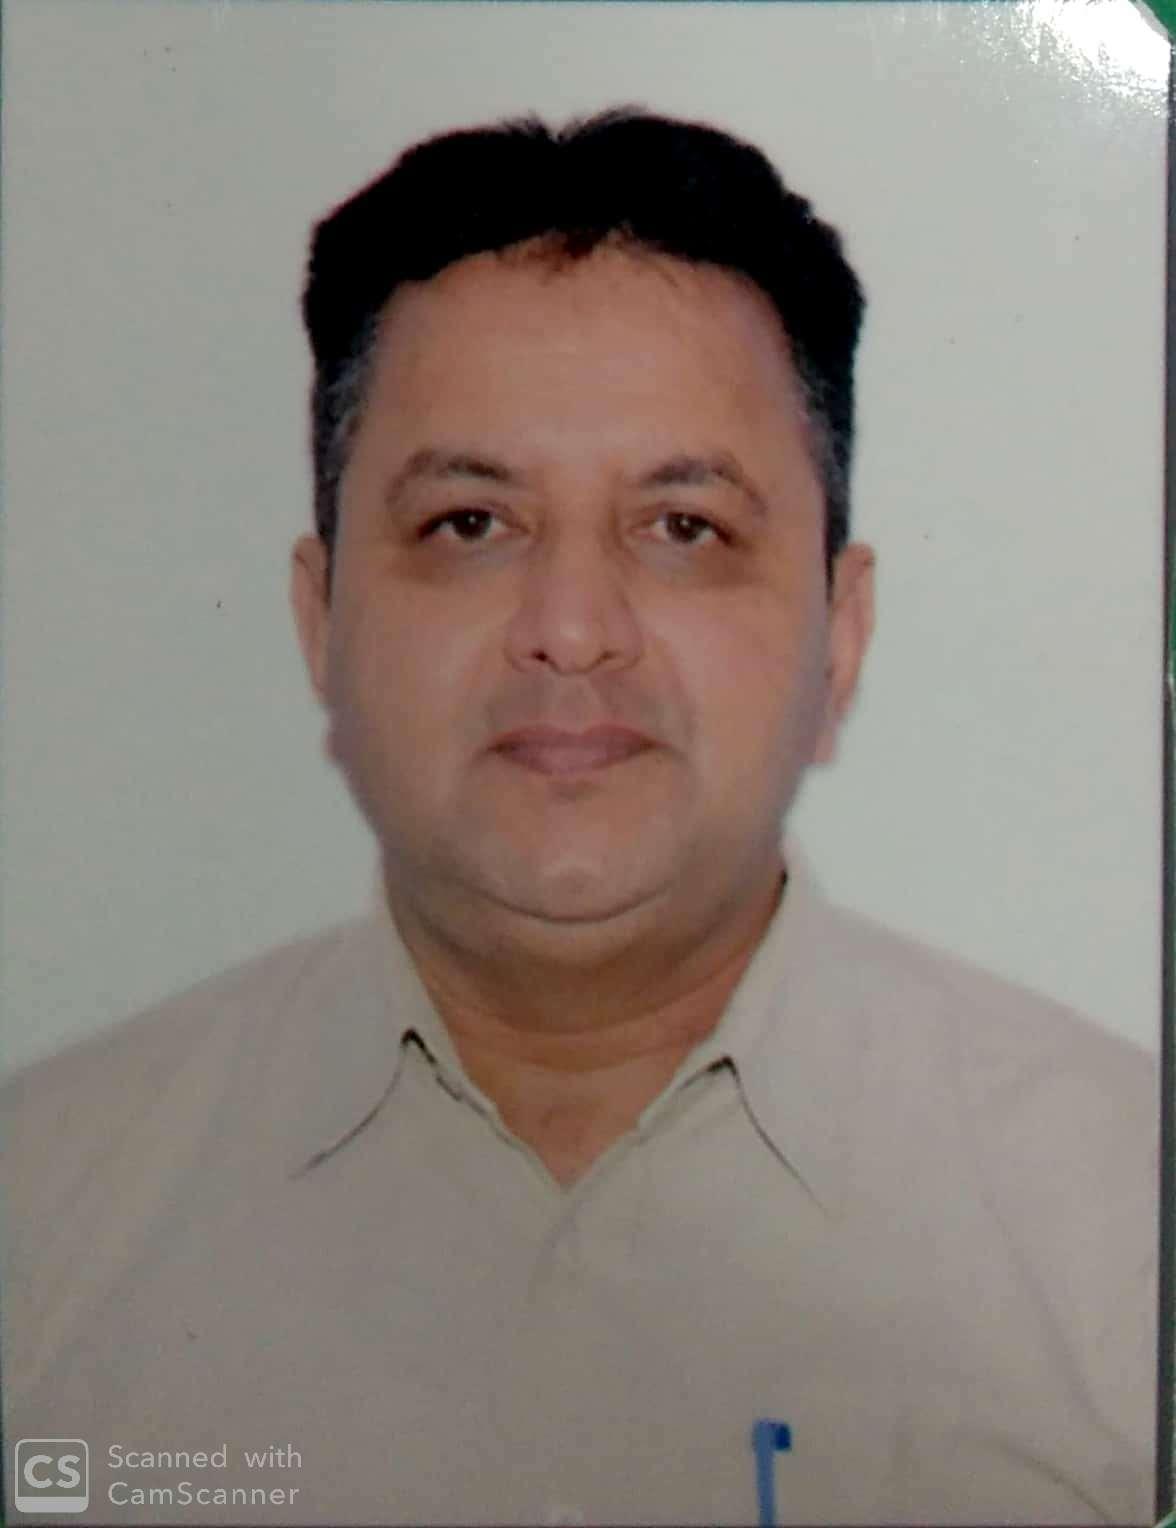 ईजी. अनिल गौतम